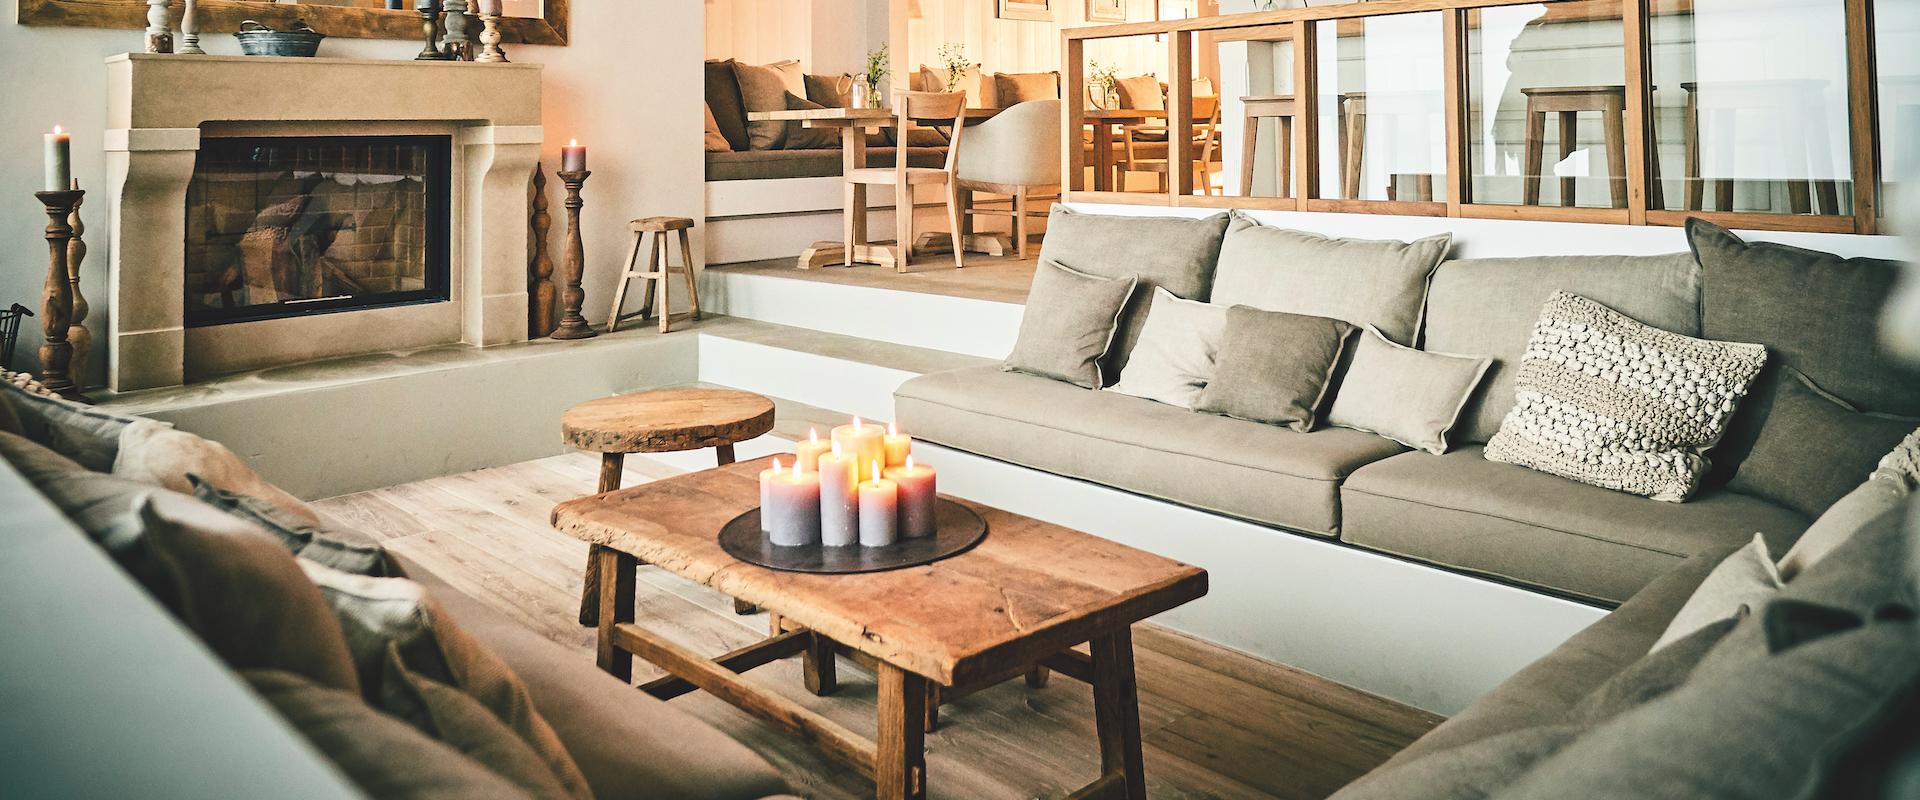 barefoot Hotel_Loungebereich mit offenem Kamin_©barefoot Hotel_Nikolaj Georgiew